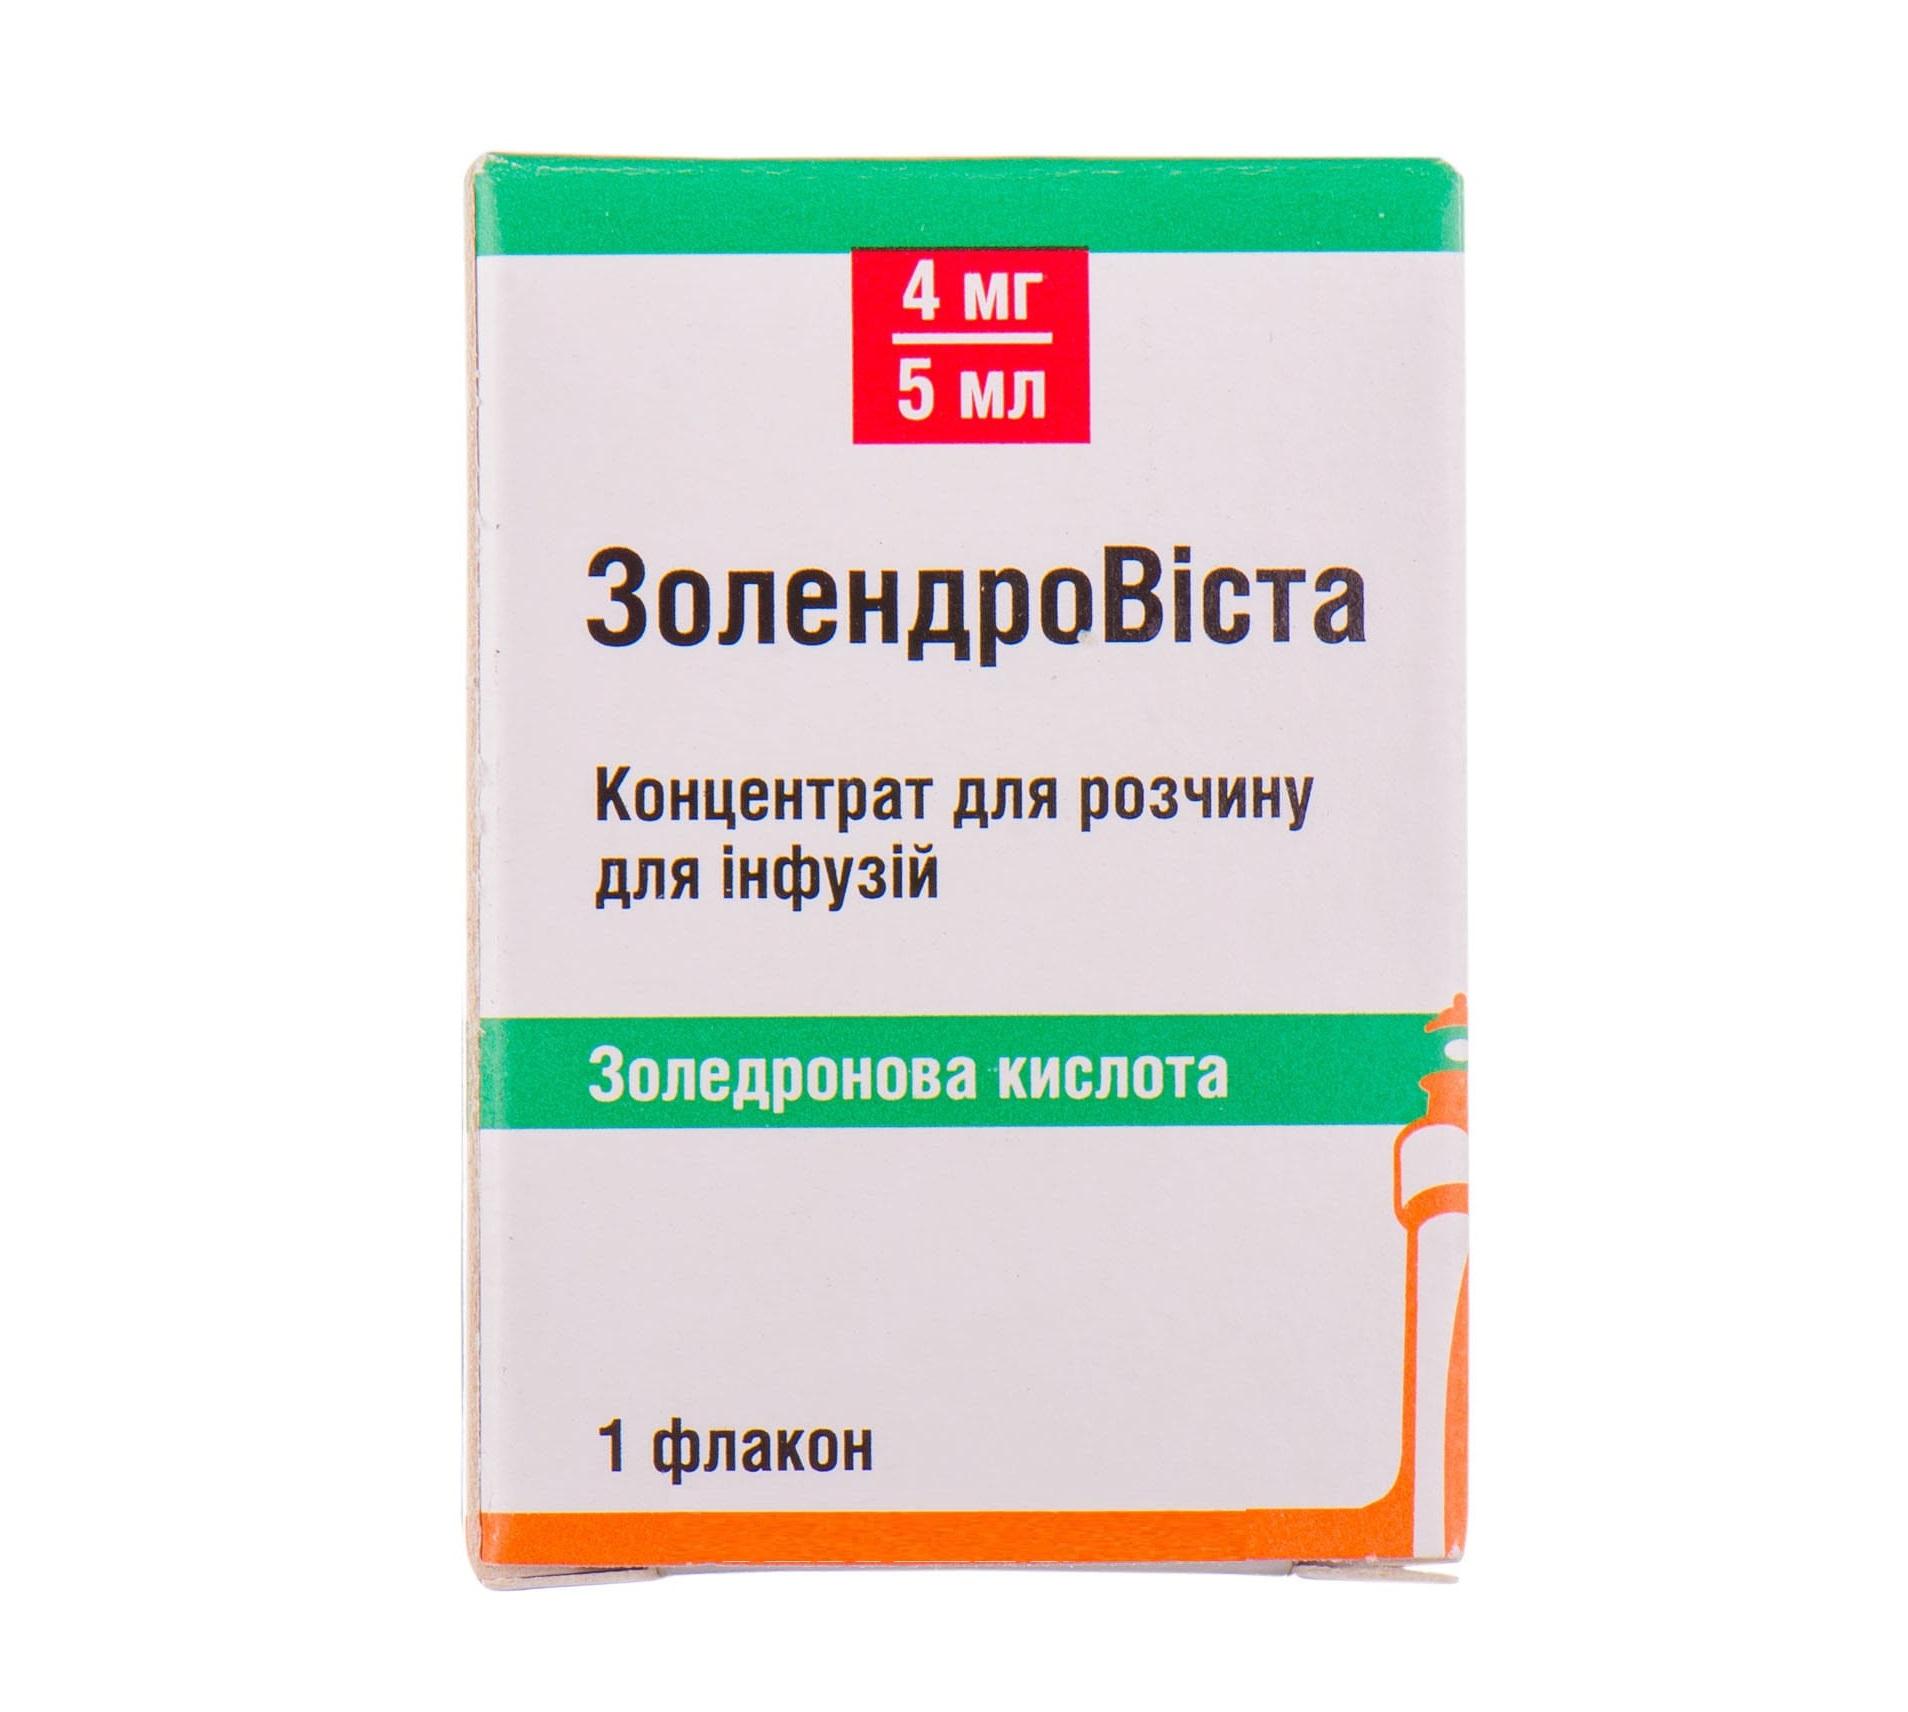 ЗОЛЕНДРОВИСТА Д/ИНФ. 4МГ/5МЛ ФЛ. №1